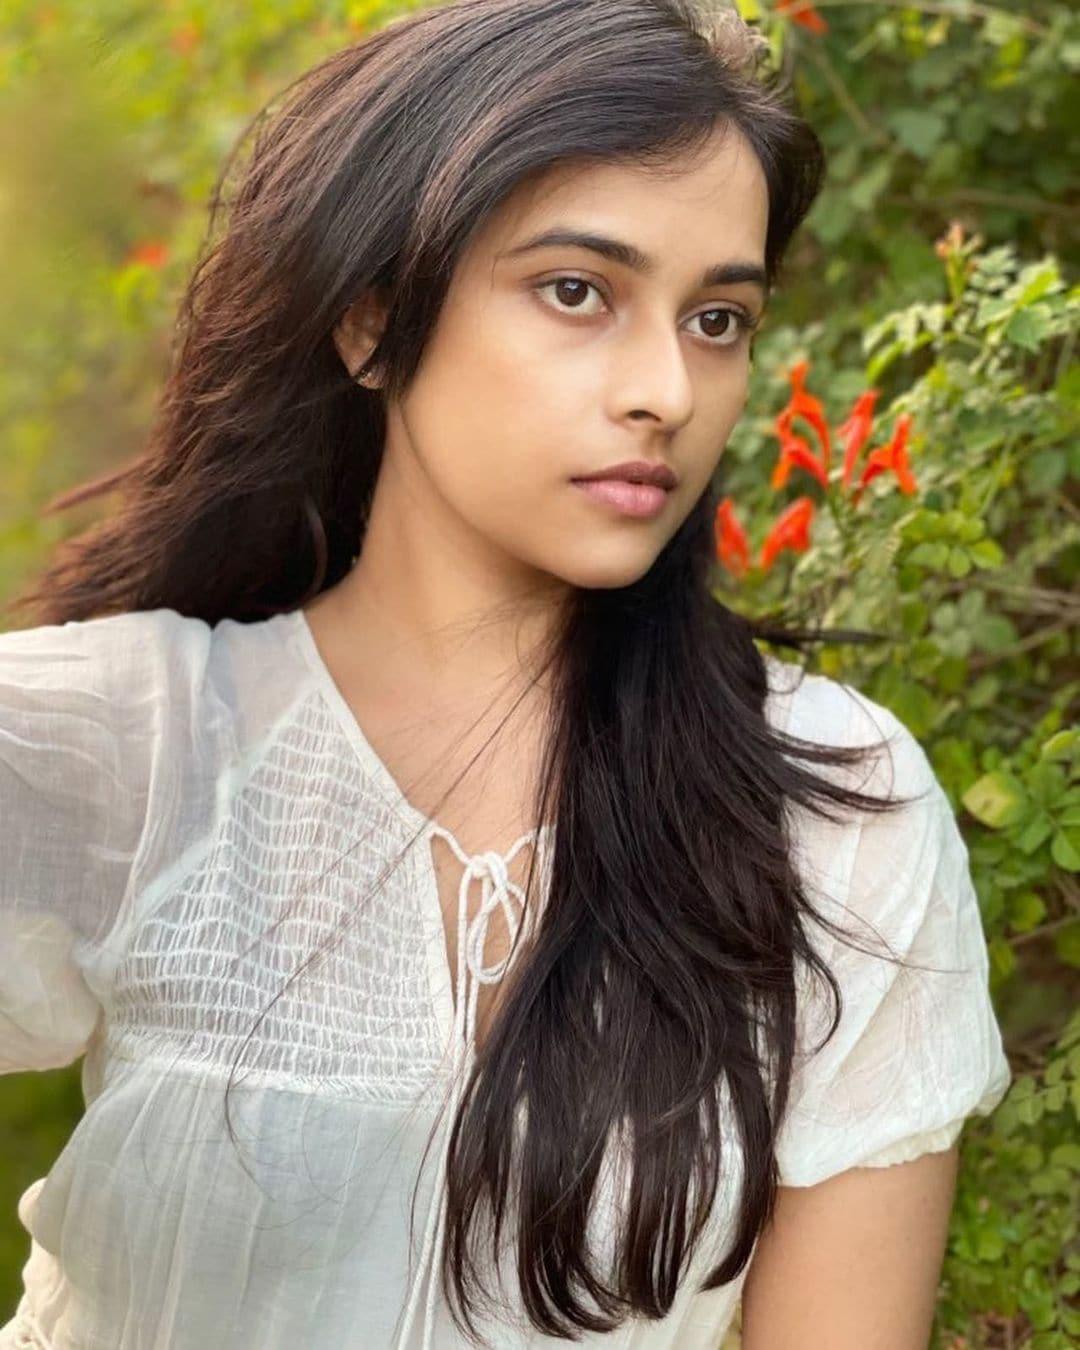 <br />நடிகை ஸ்ரீ திவ்யா ( Image :Instagram @sd_sridivya)